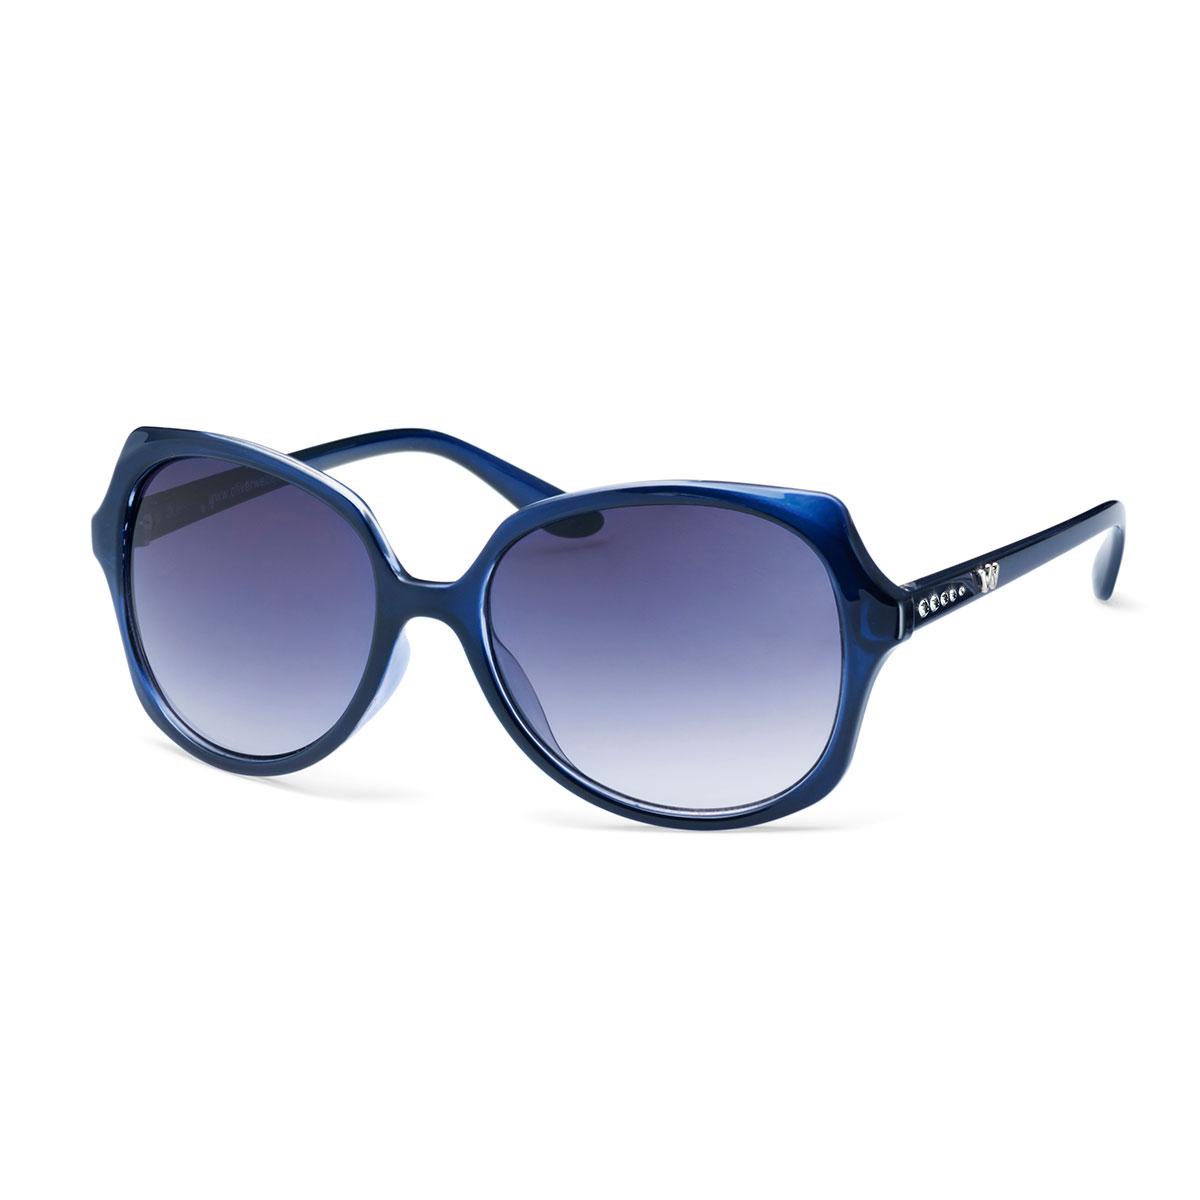 عینک آفتابی مدل کلمبیا آبی